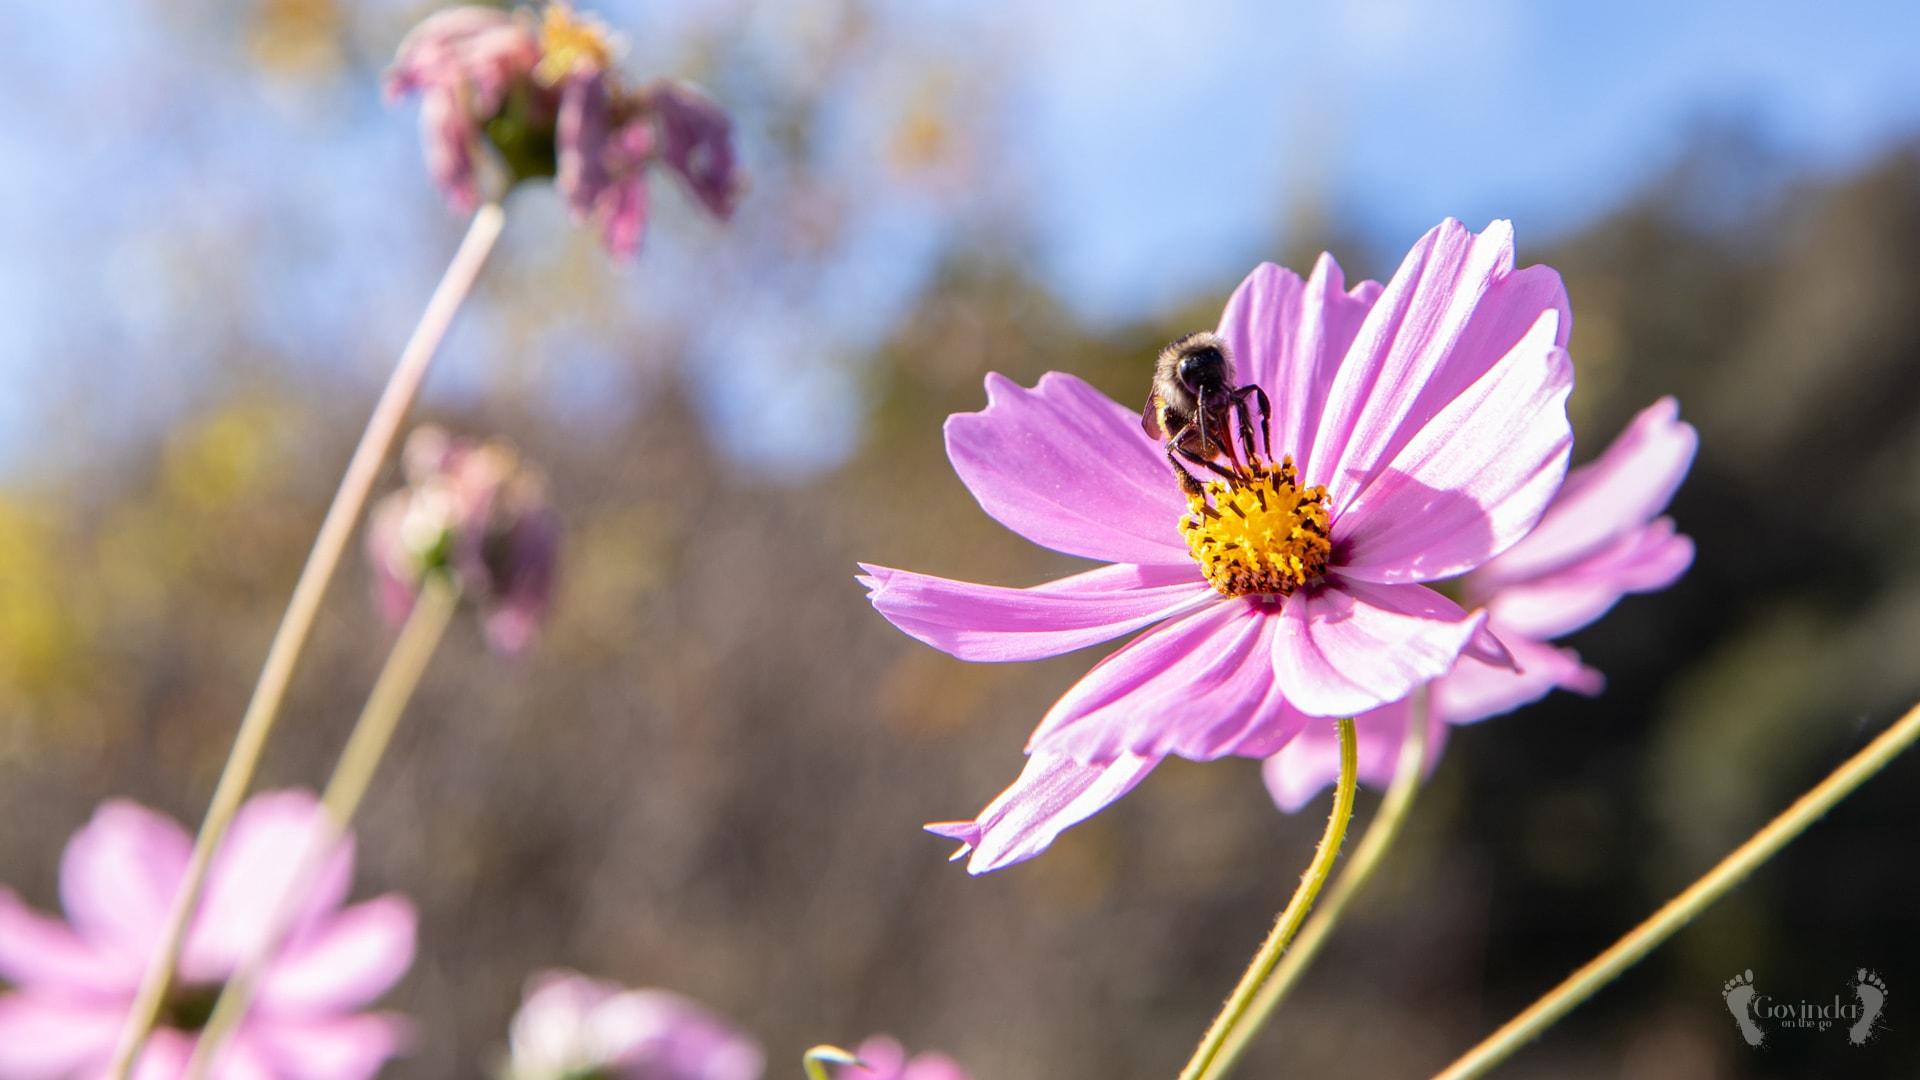 Himalayan bee on Himalayan flower